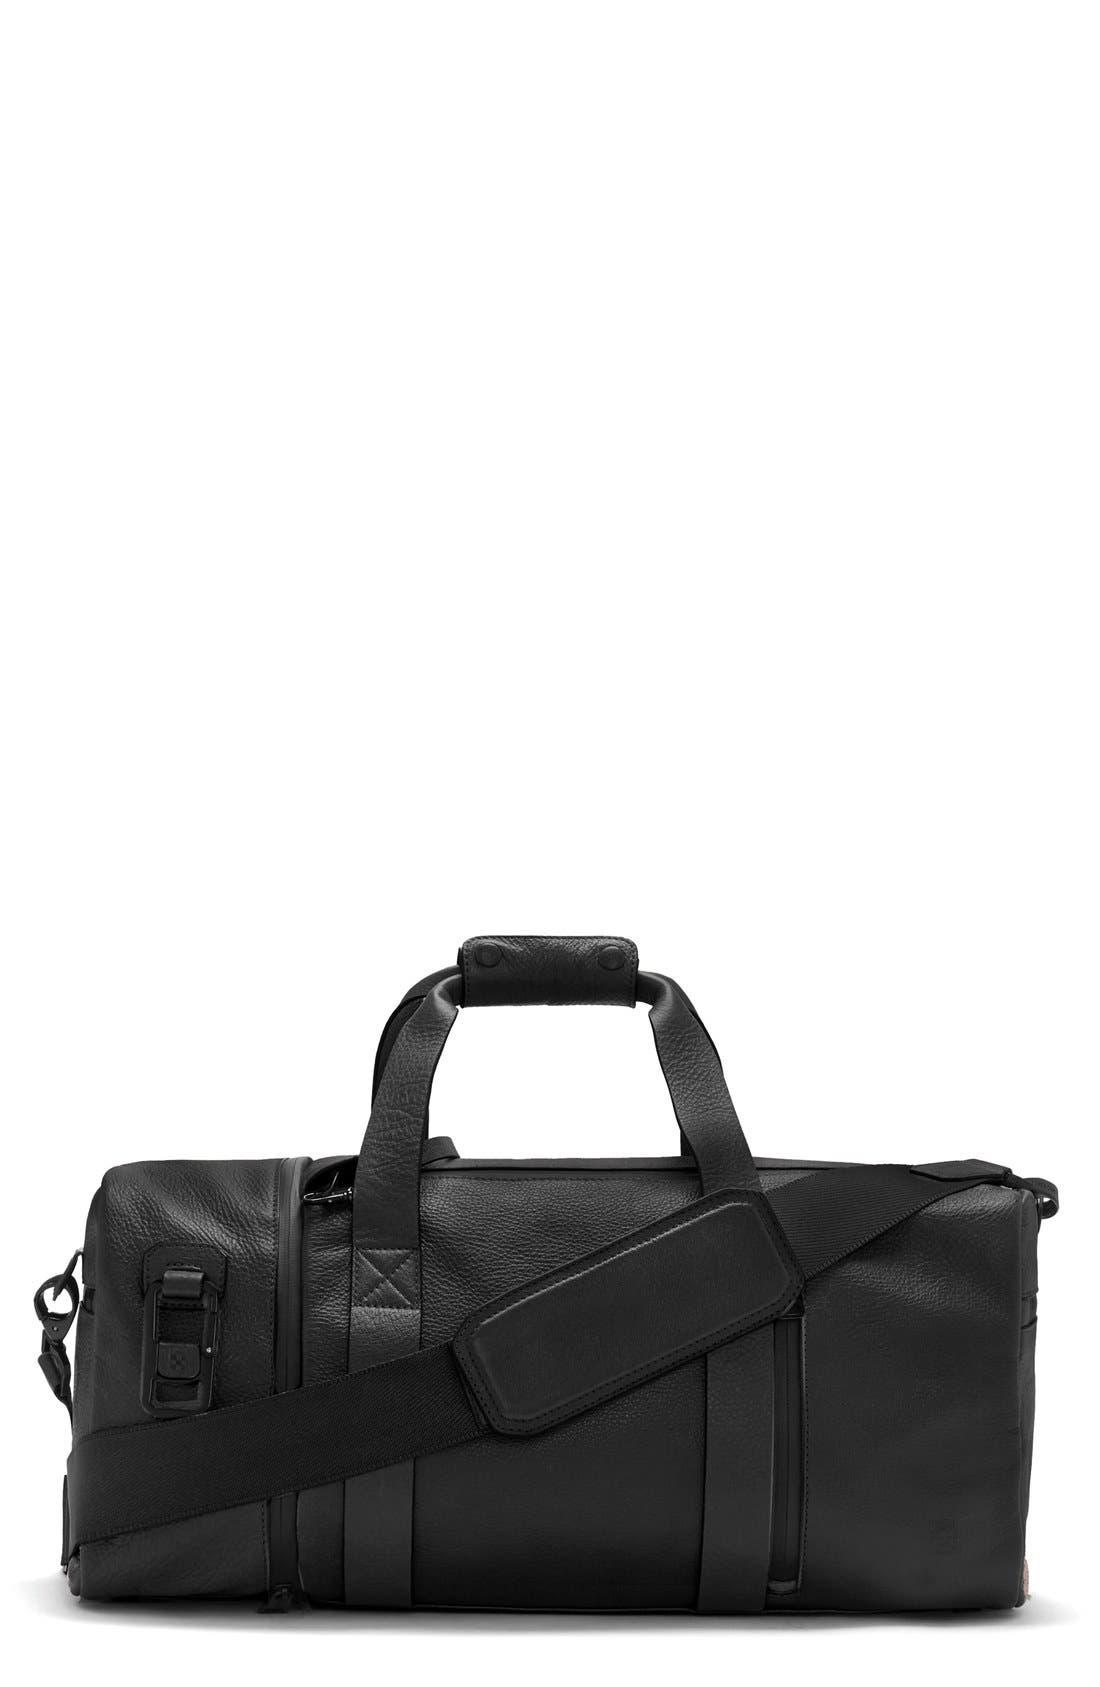 'Mestr' Leather & Suede Duffel Bag,                         Main,                         color, 001